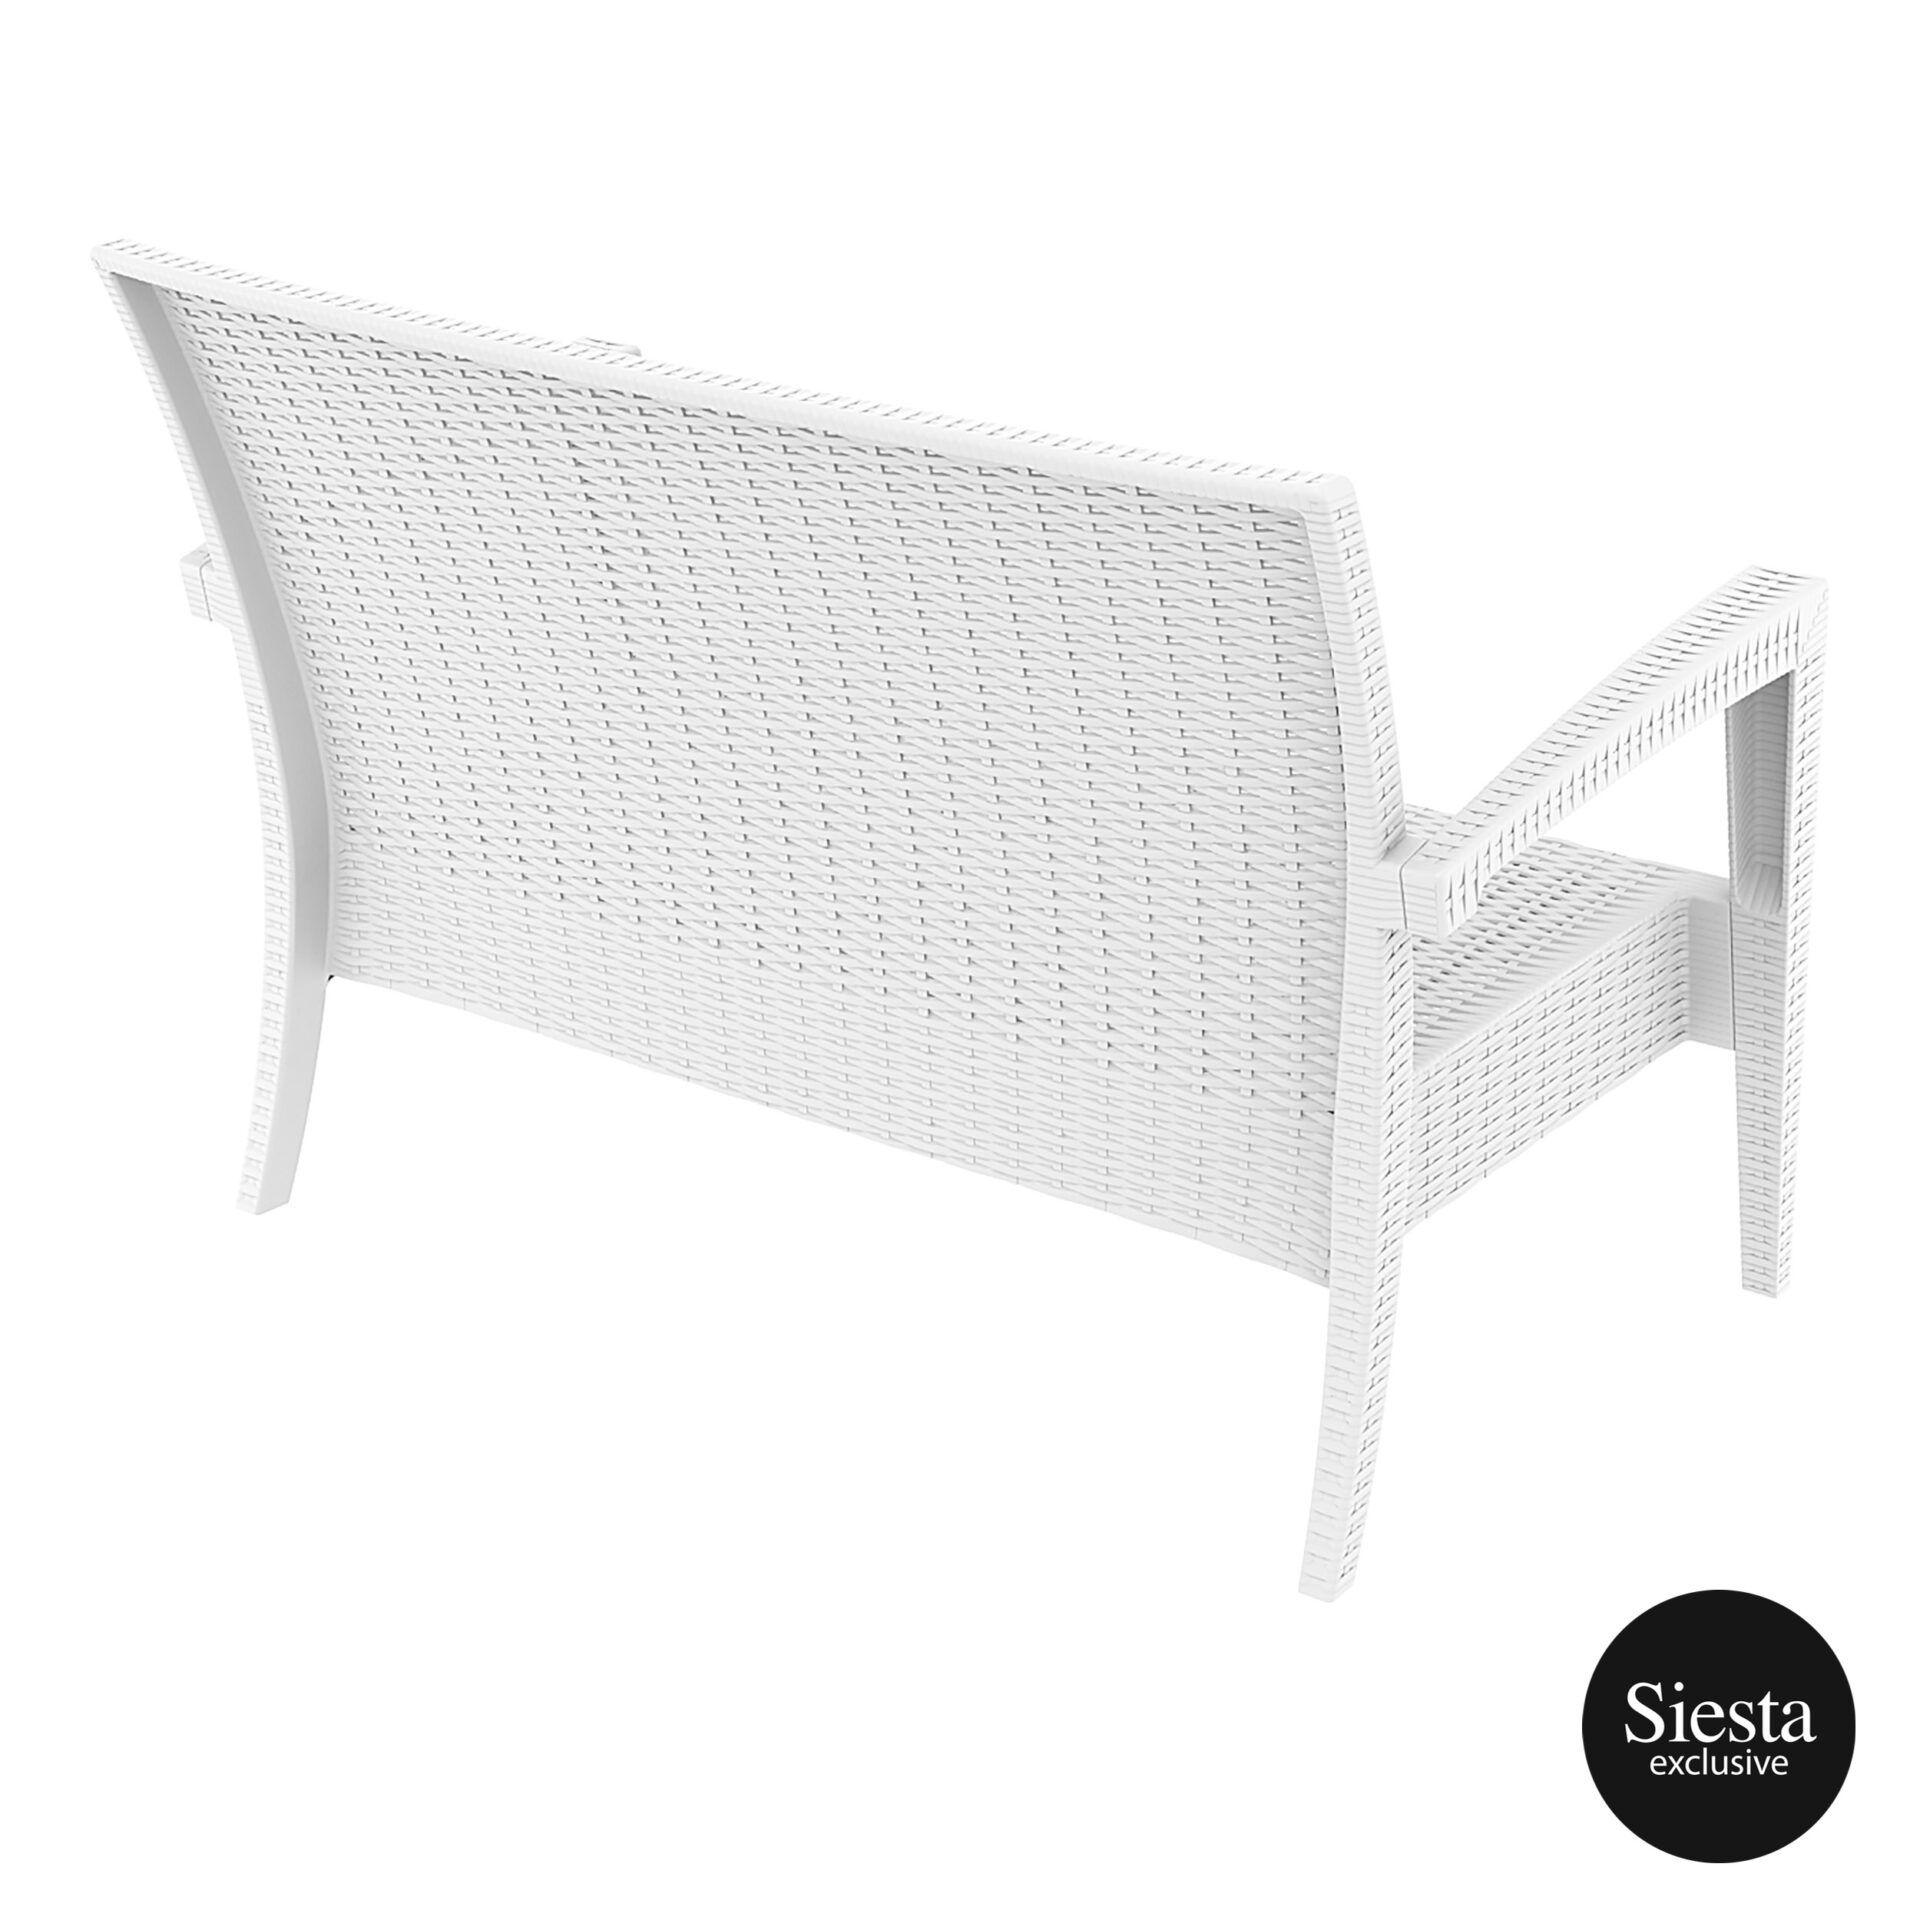 Resin Rattan Miami Tequila Lounge sofa white back side